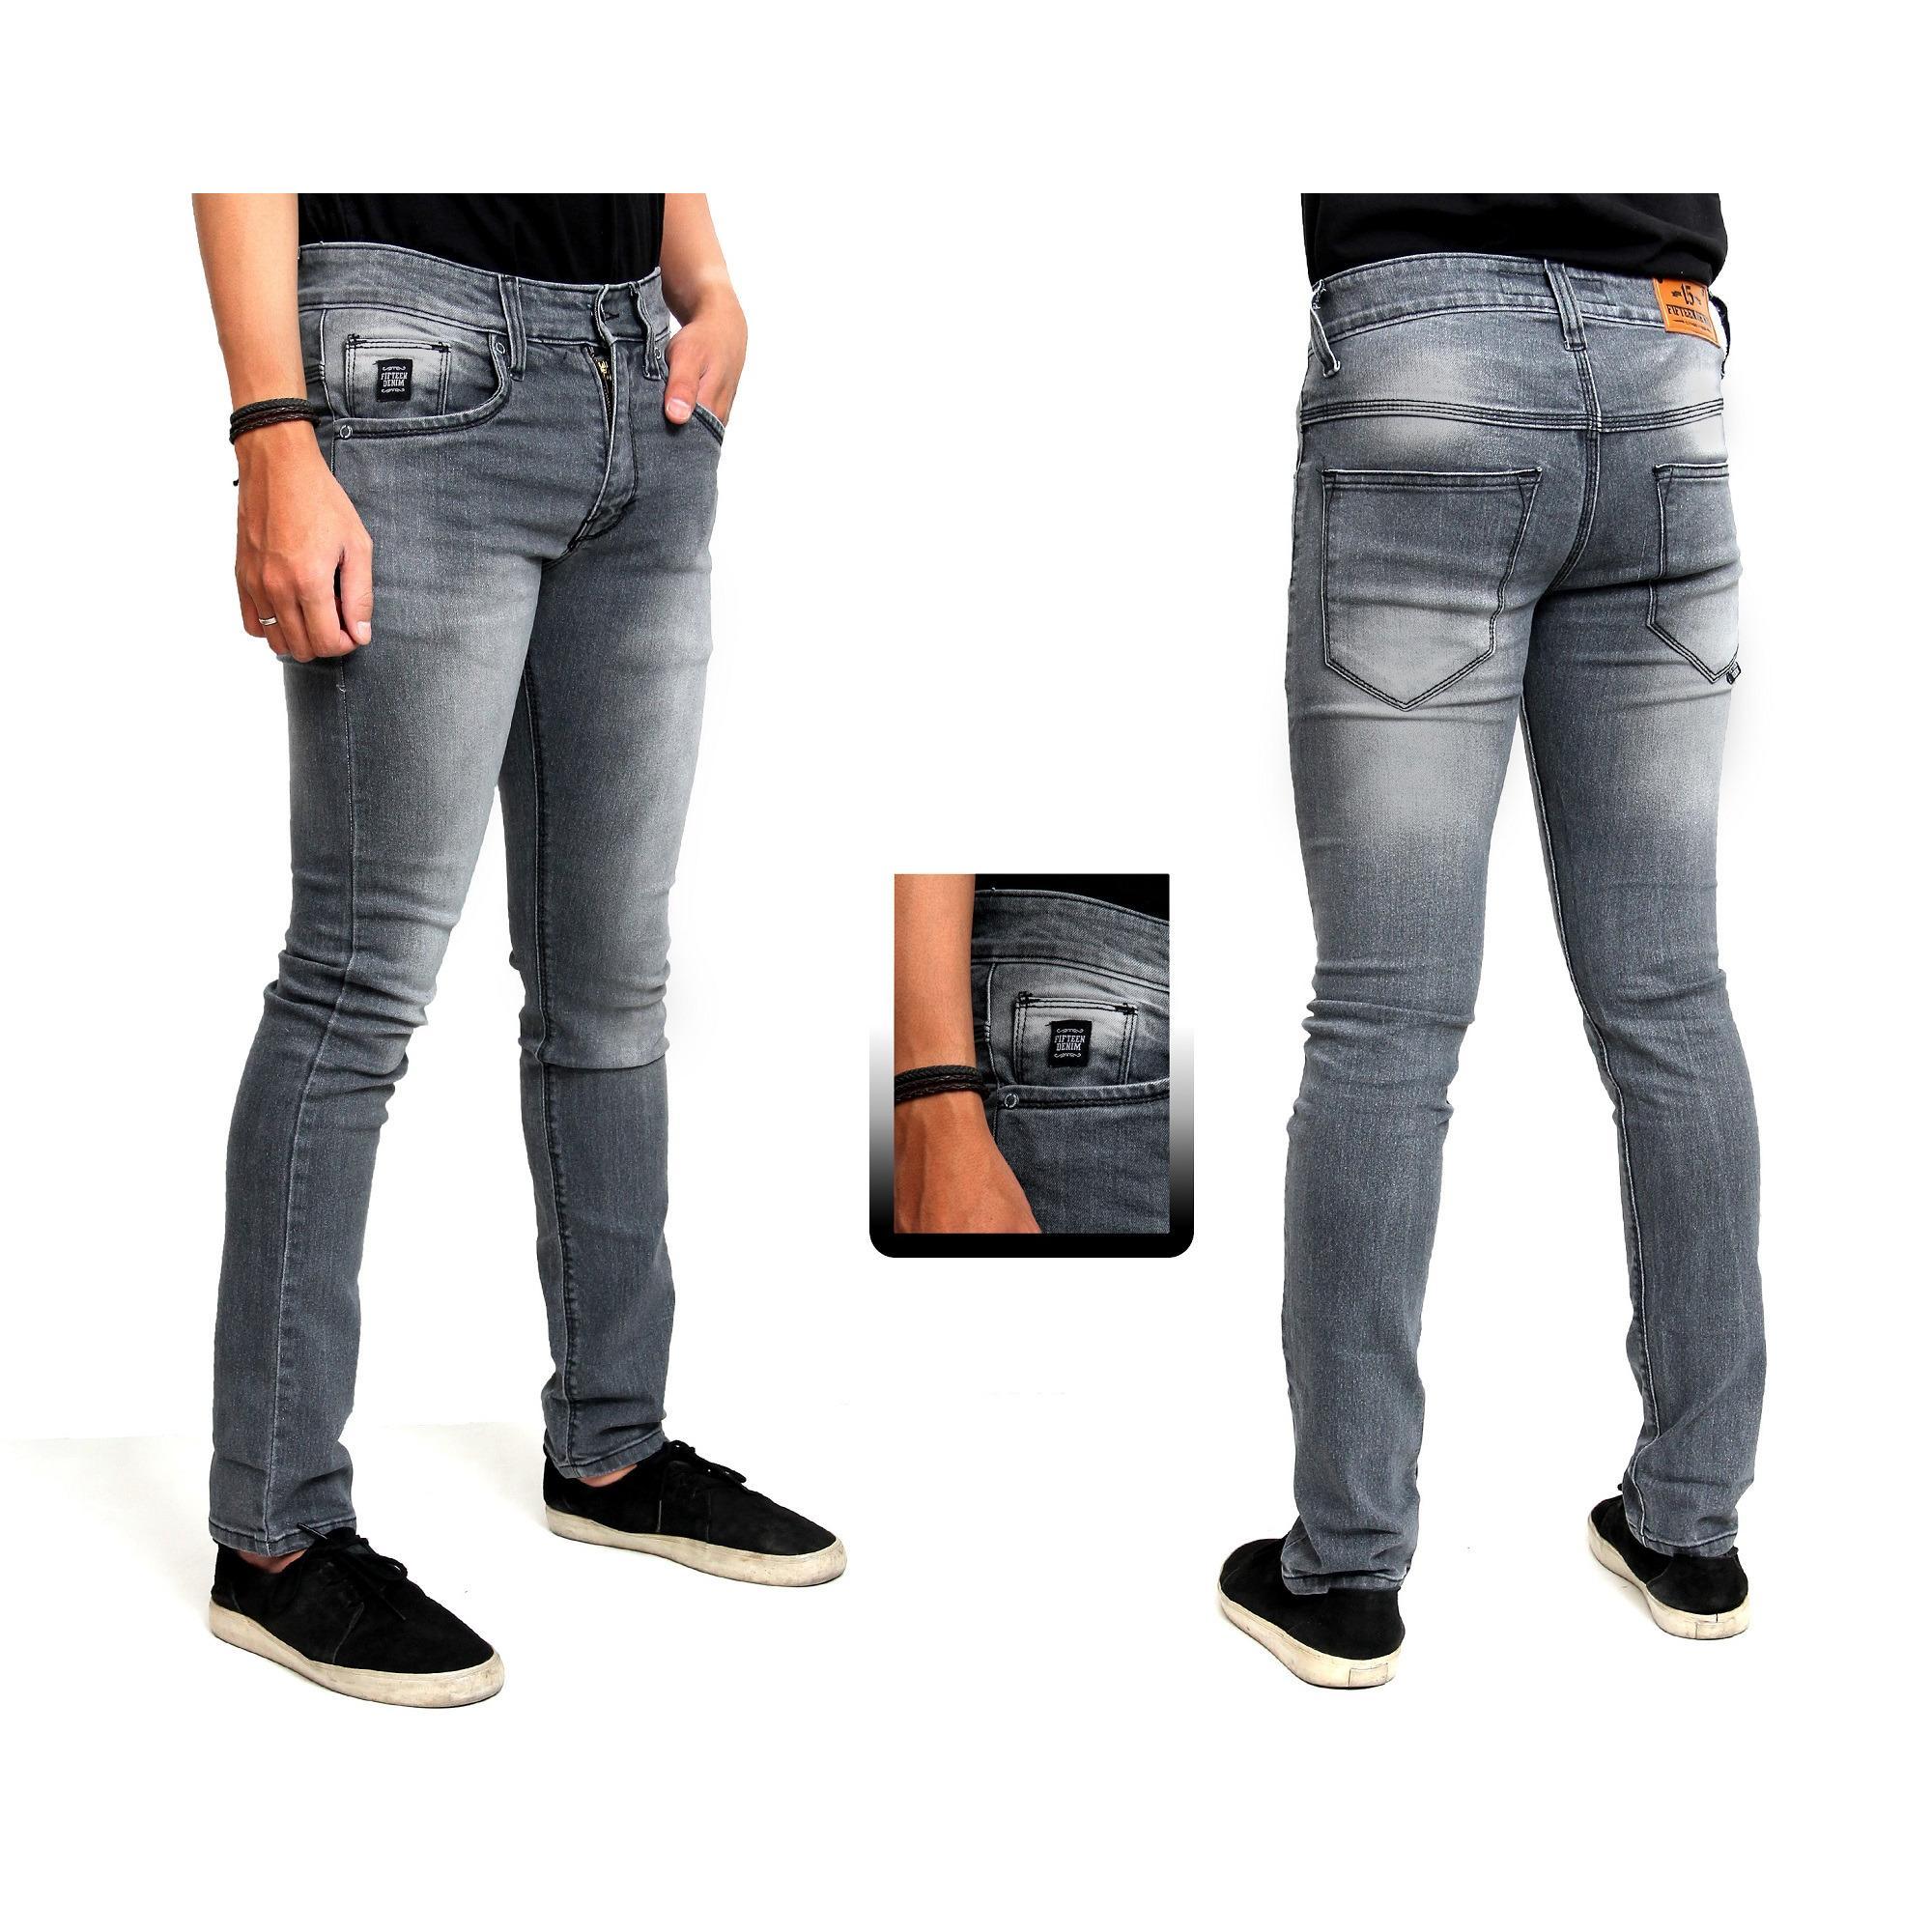 R.S.T.R. celana jeans skiny pria - celana jeans pensil - Celana jeans jumbo  XXL XXXL - black scrup - Hitam - Biru dongker - Biru muda - Biru tua  eff470a697